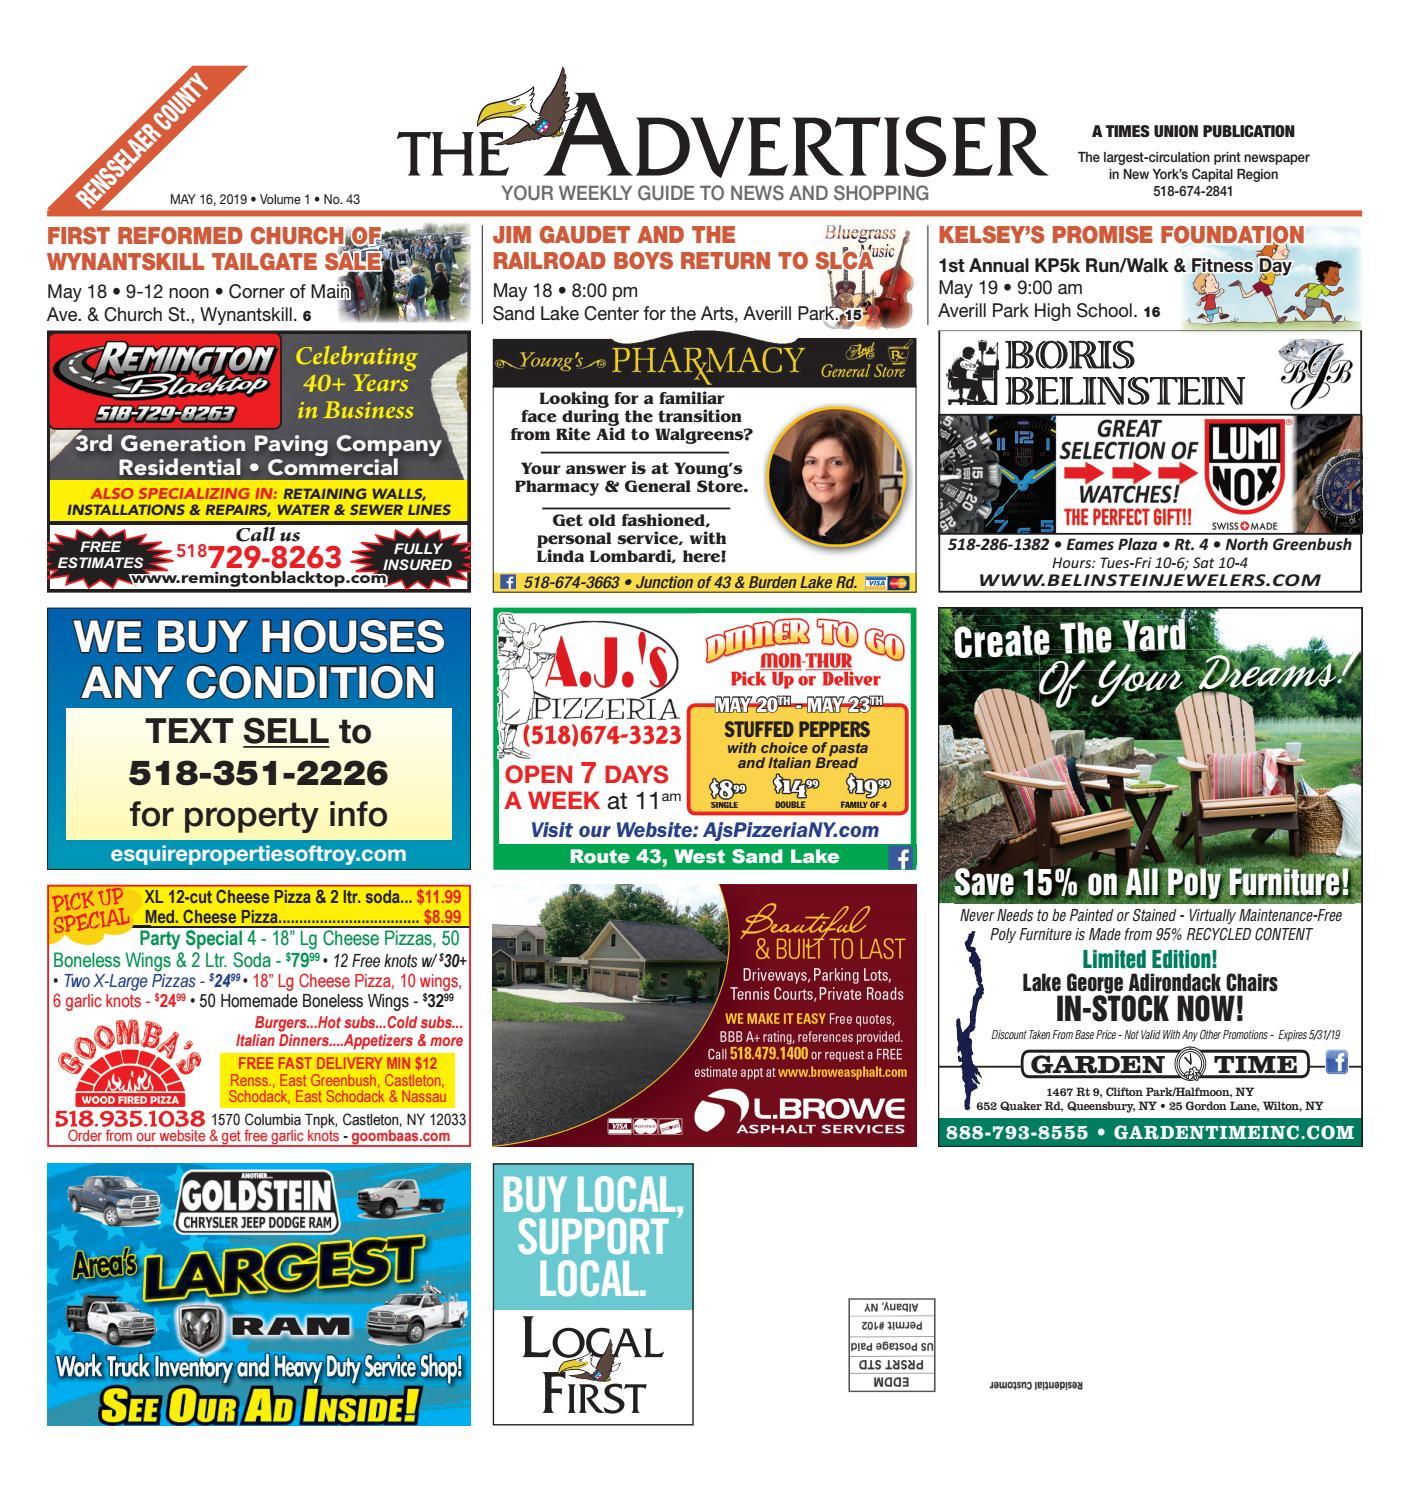 Transformation Grange En Habitation Rt 2012 local first the advertiser 051619capital region weekly